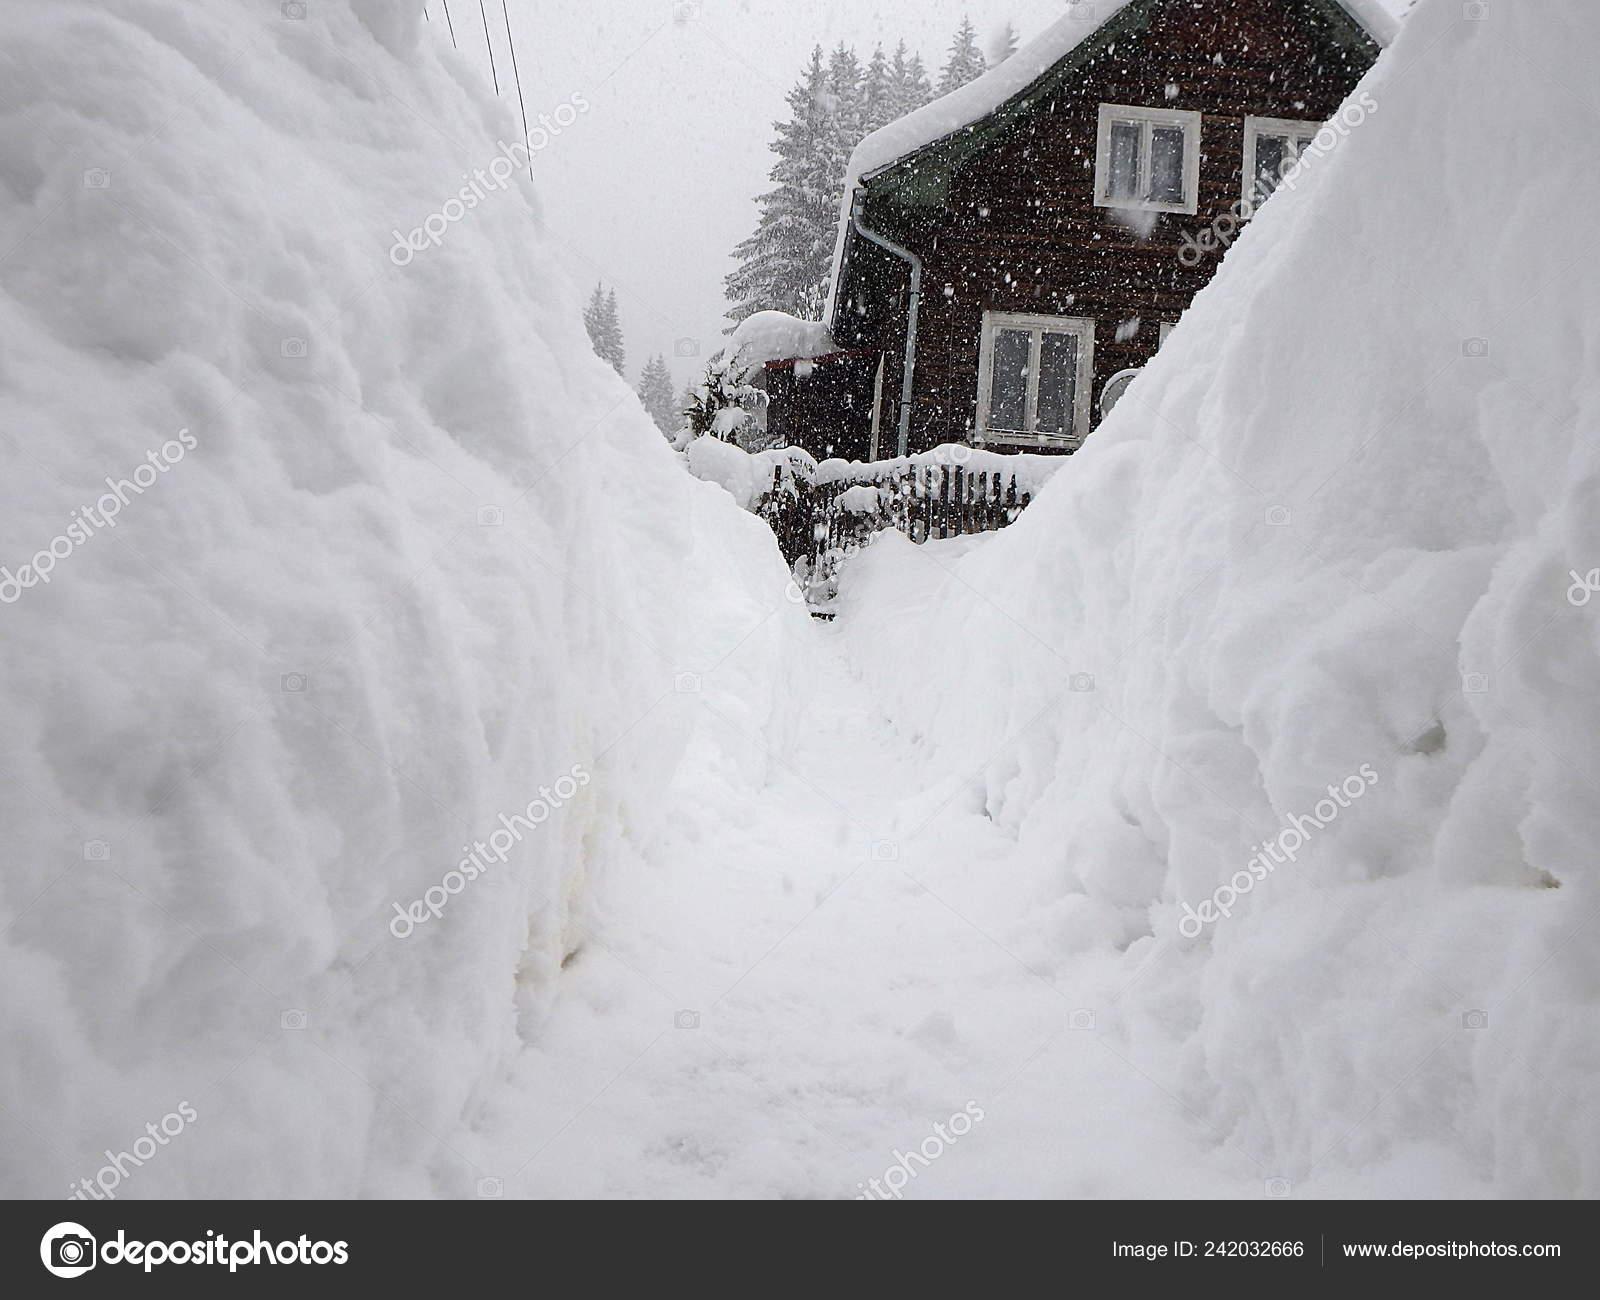 Extreme Snow Calamity Winter Weather Snowstorm Slovakia